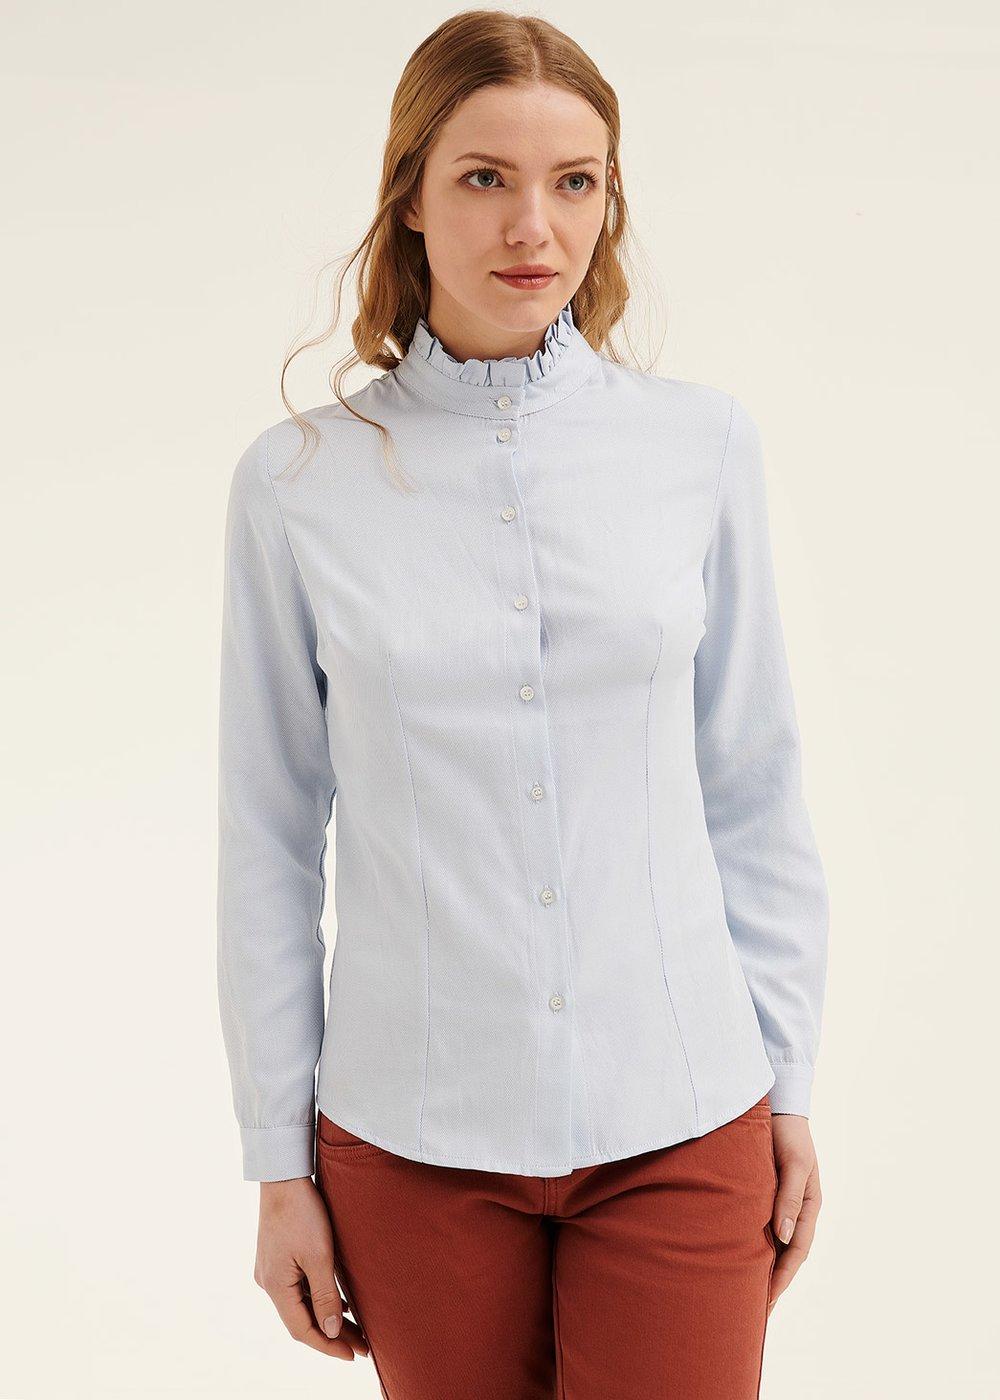 Cathryn shirt with ruffled collar - Sky - Woman